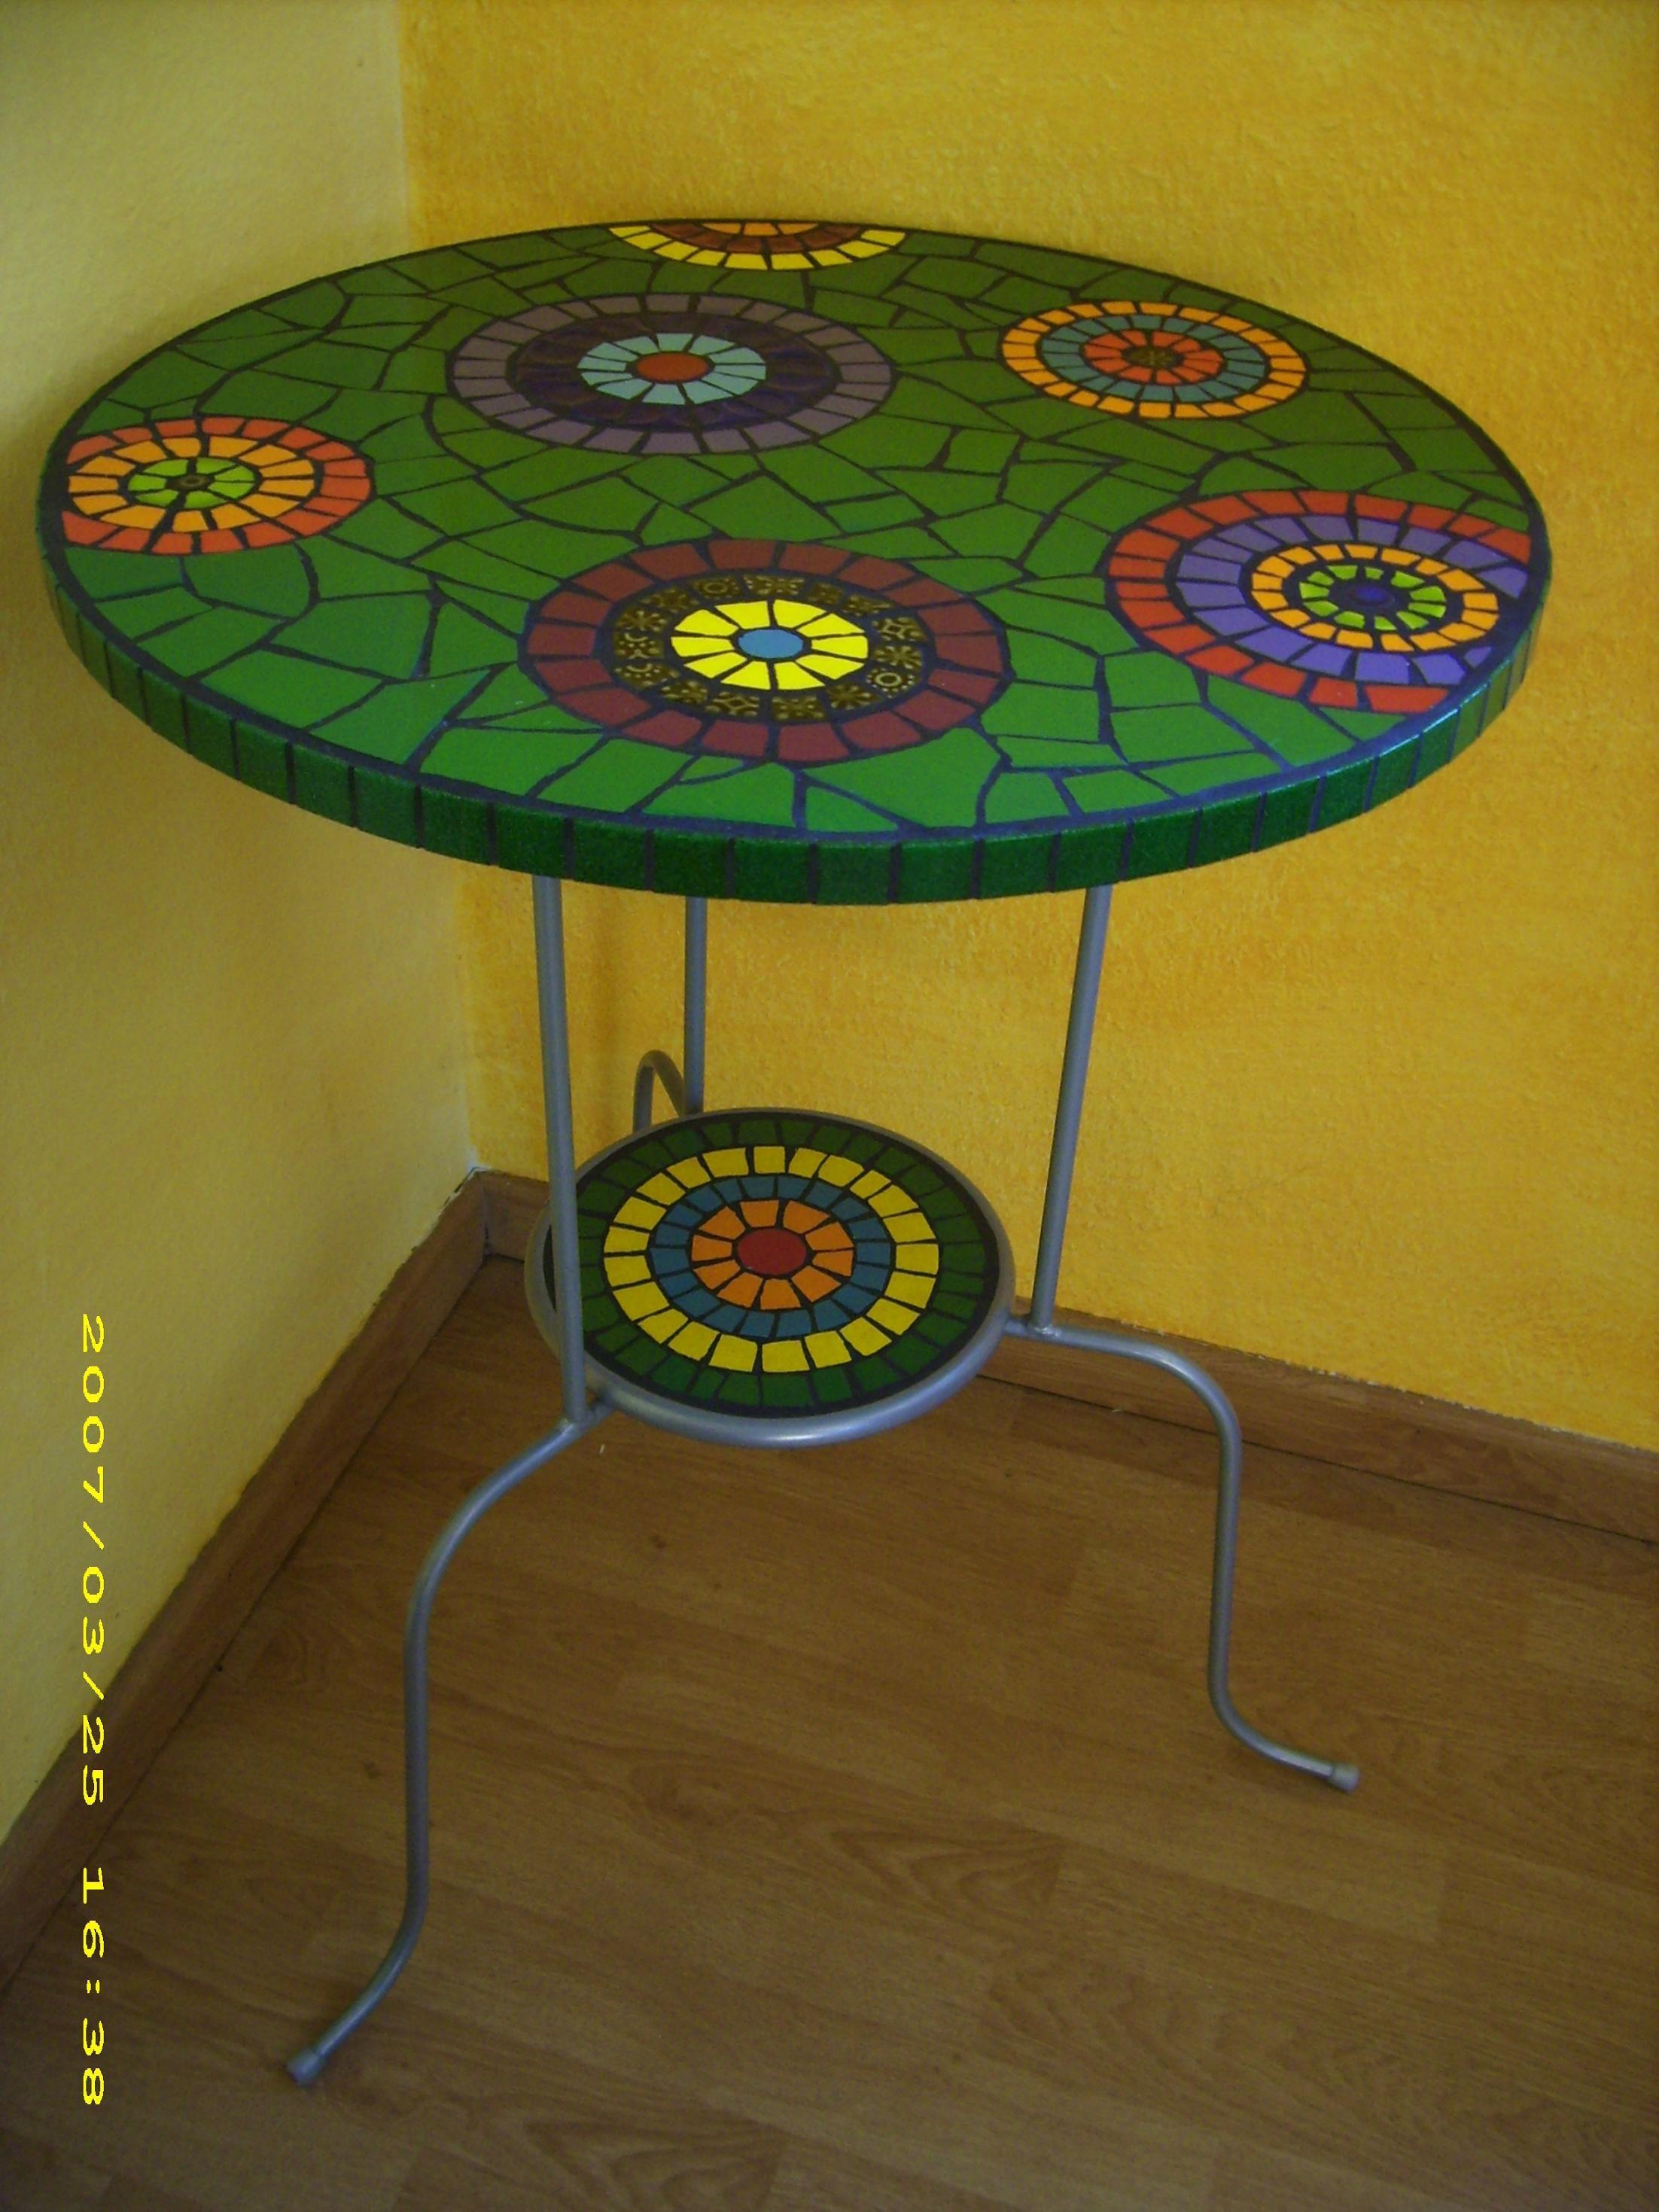 mosaik tisch ikea mosaik pinterest mosaik ikea. Black Bedroom Furniture Sets. Home Design Ideas